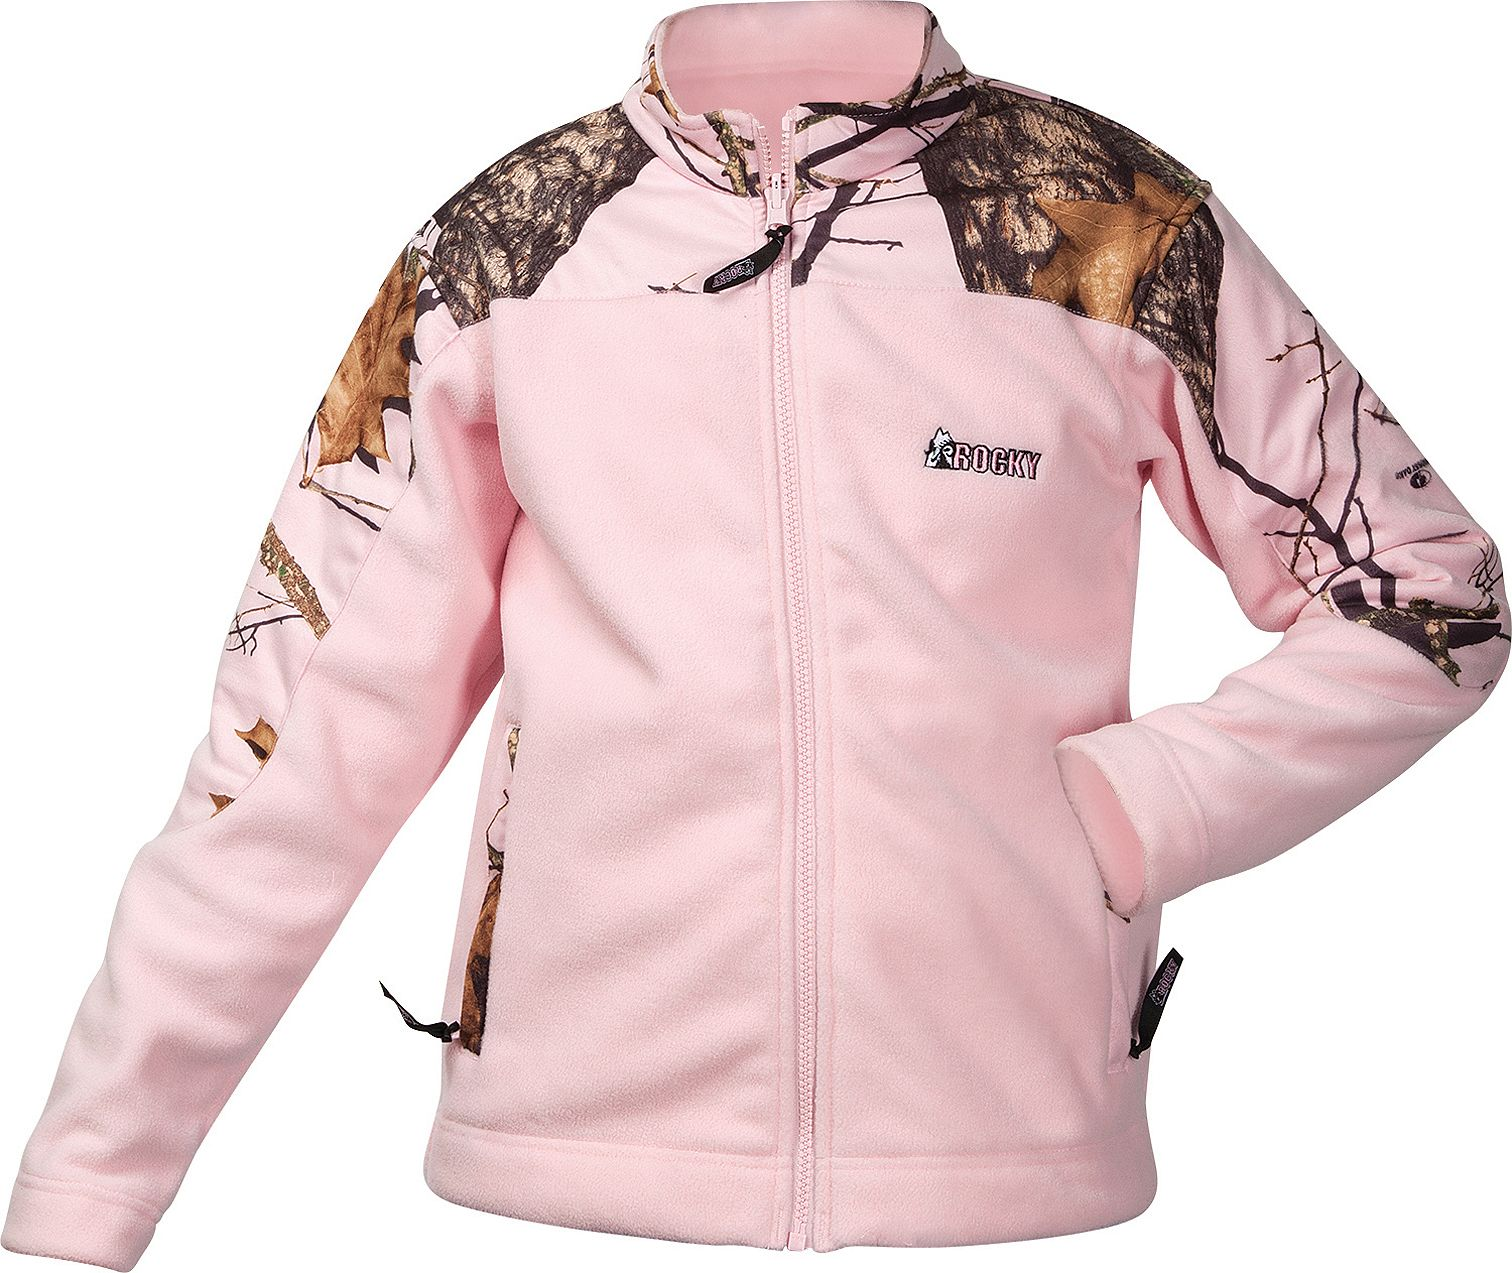 Rocky Girls Realtree Camo Fleece Jacket Sheplers